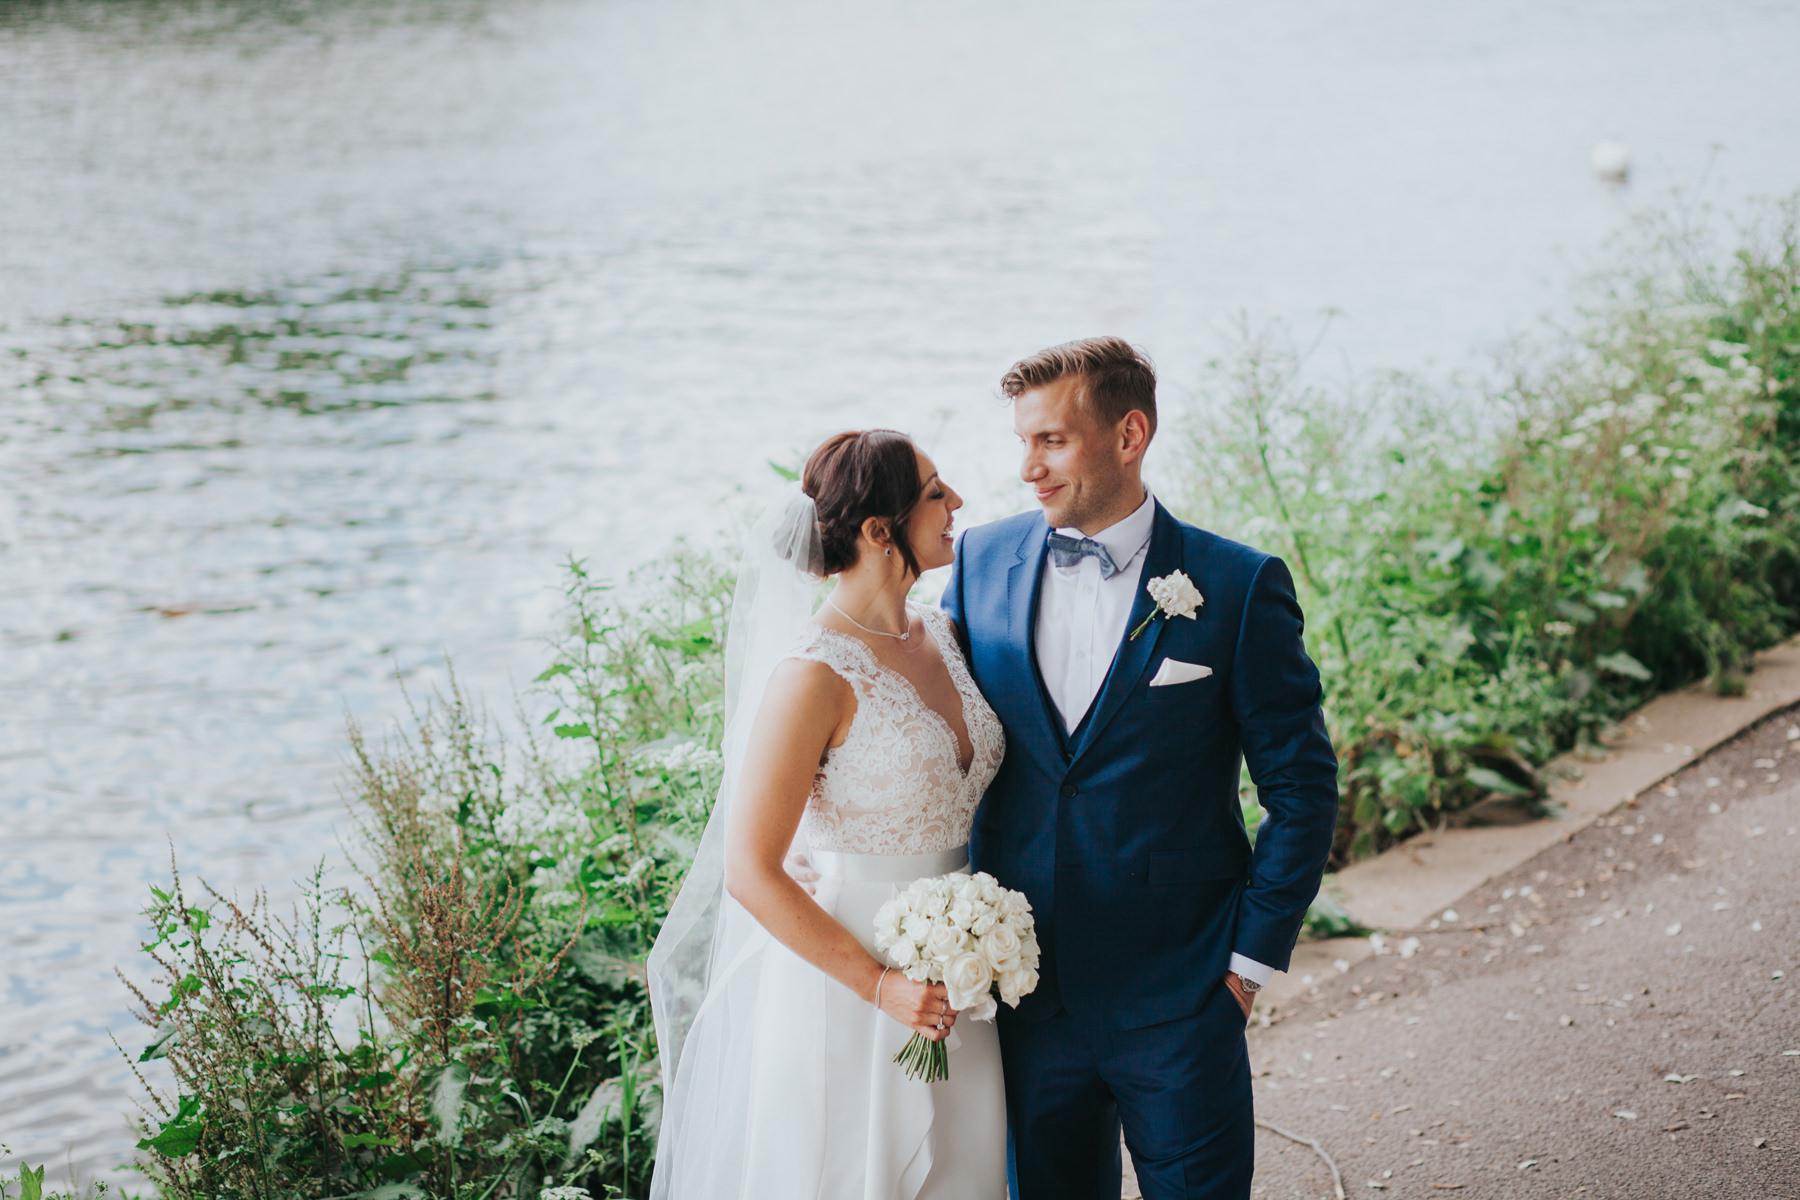 CRL-405-The Bingham wedding Richmond-Claire Rob bridal couple portraits on Thamespath.jpg